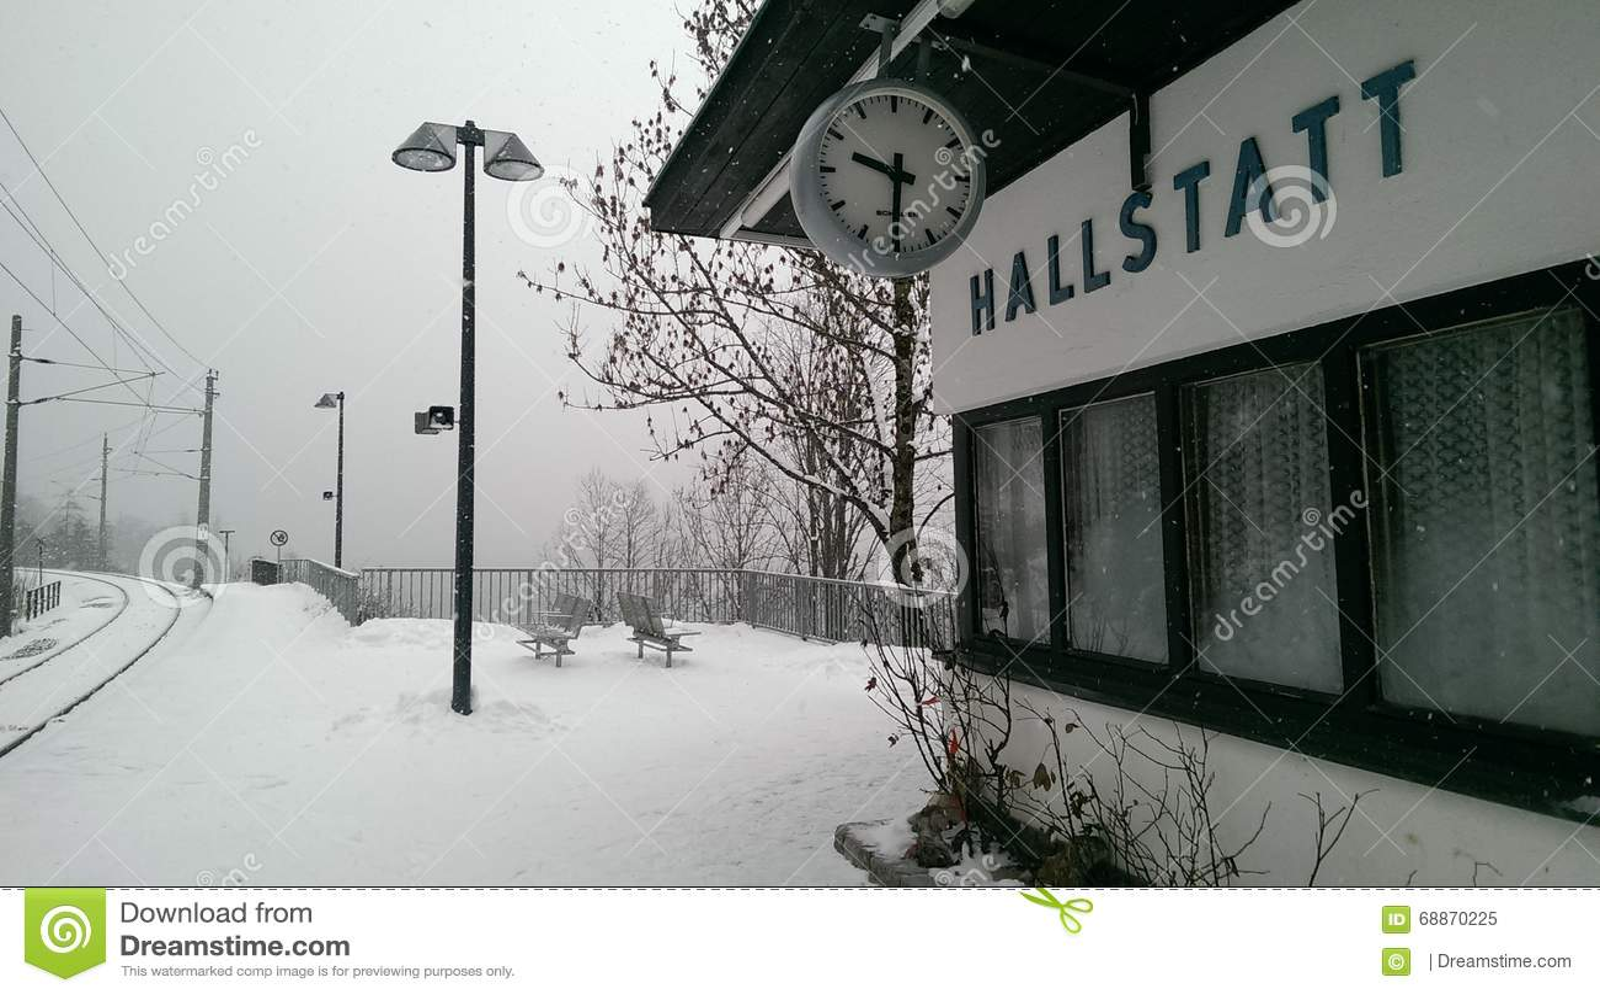 Hallstatt dans la vue de neige, Autriche